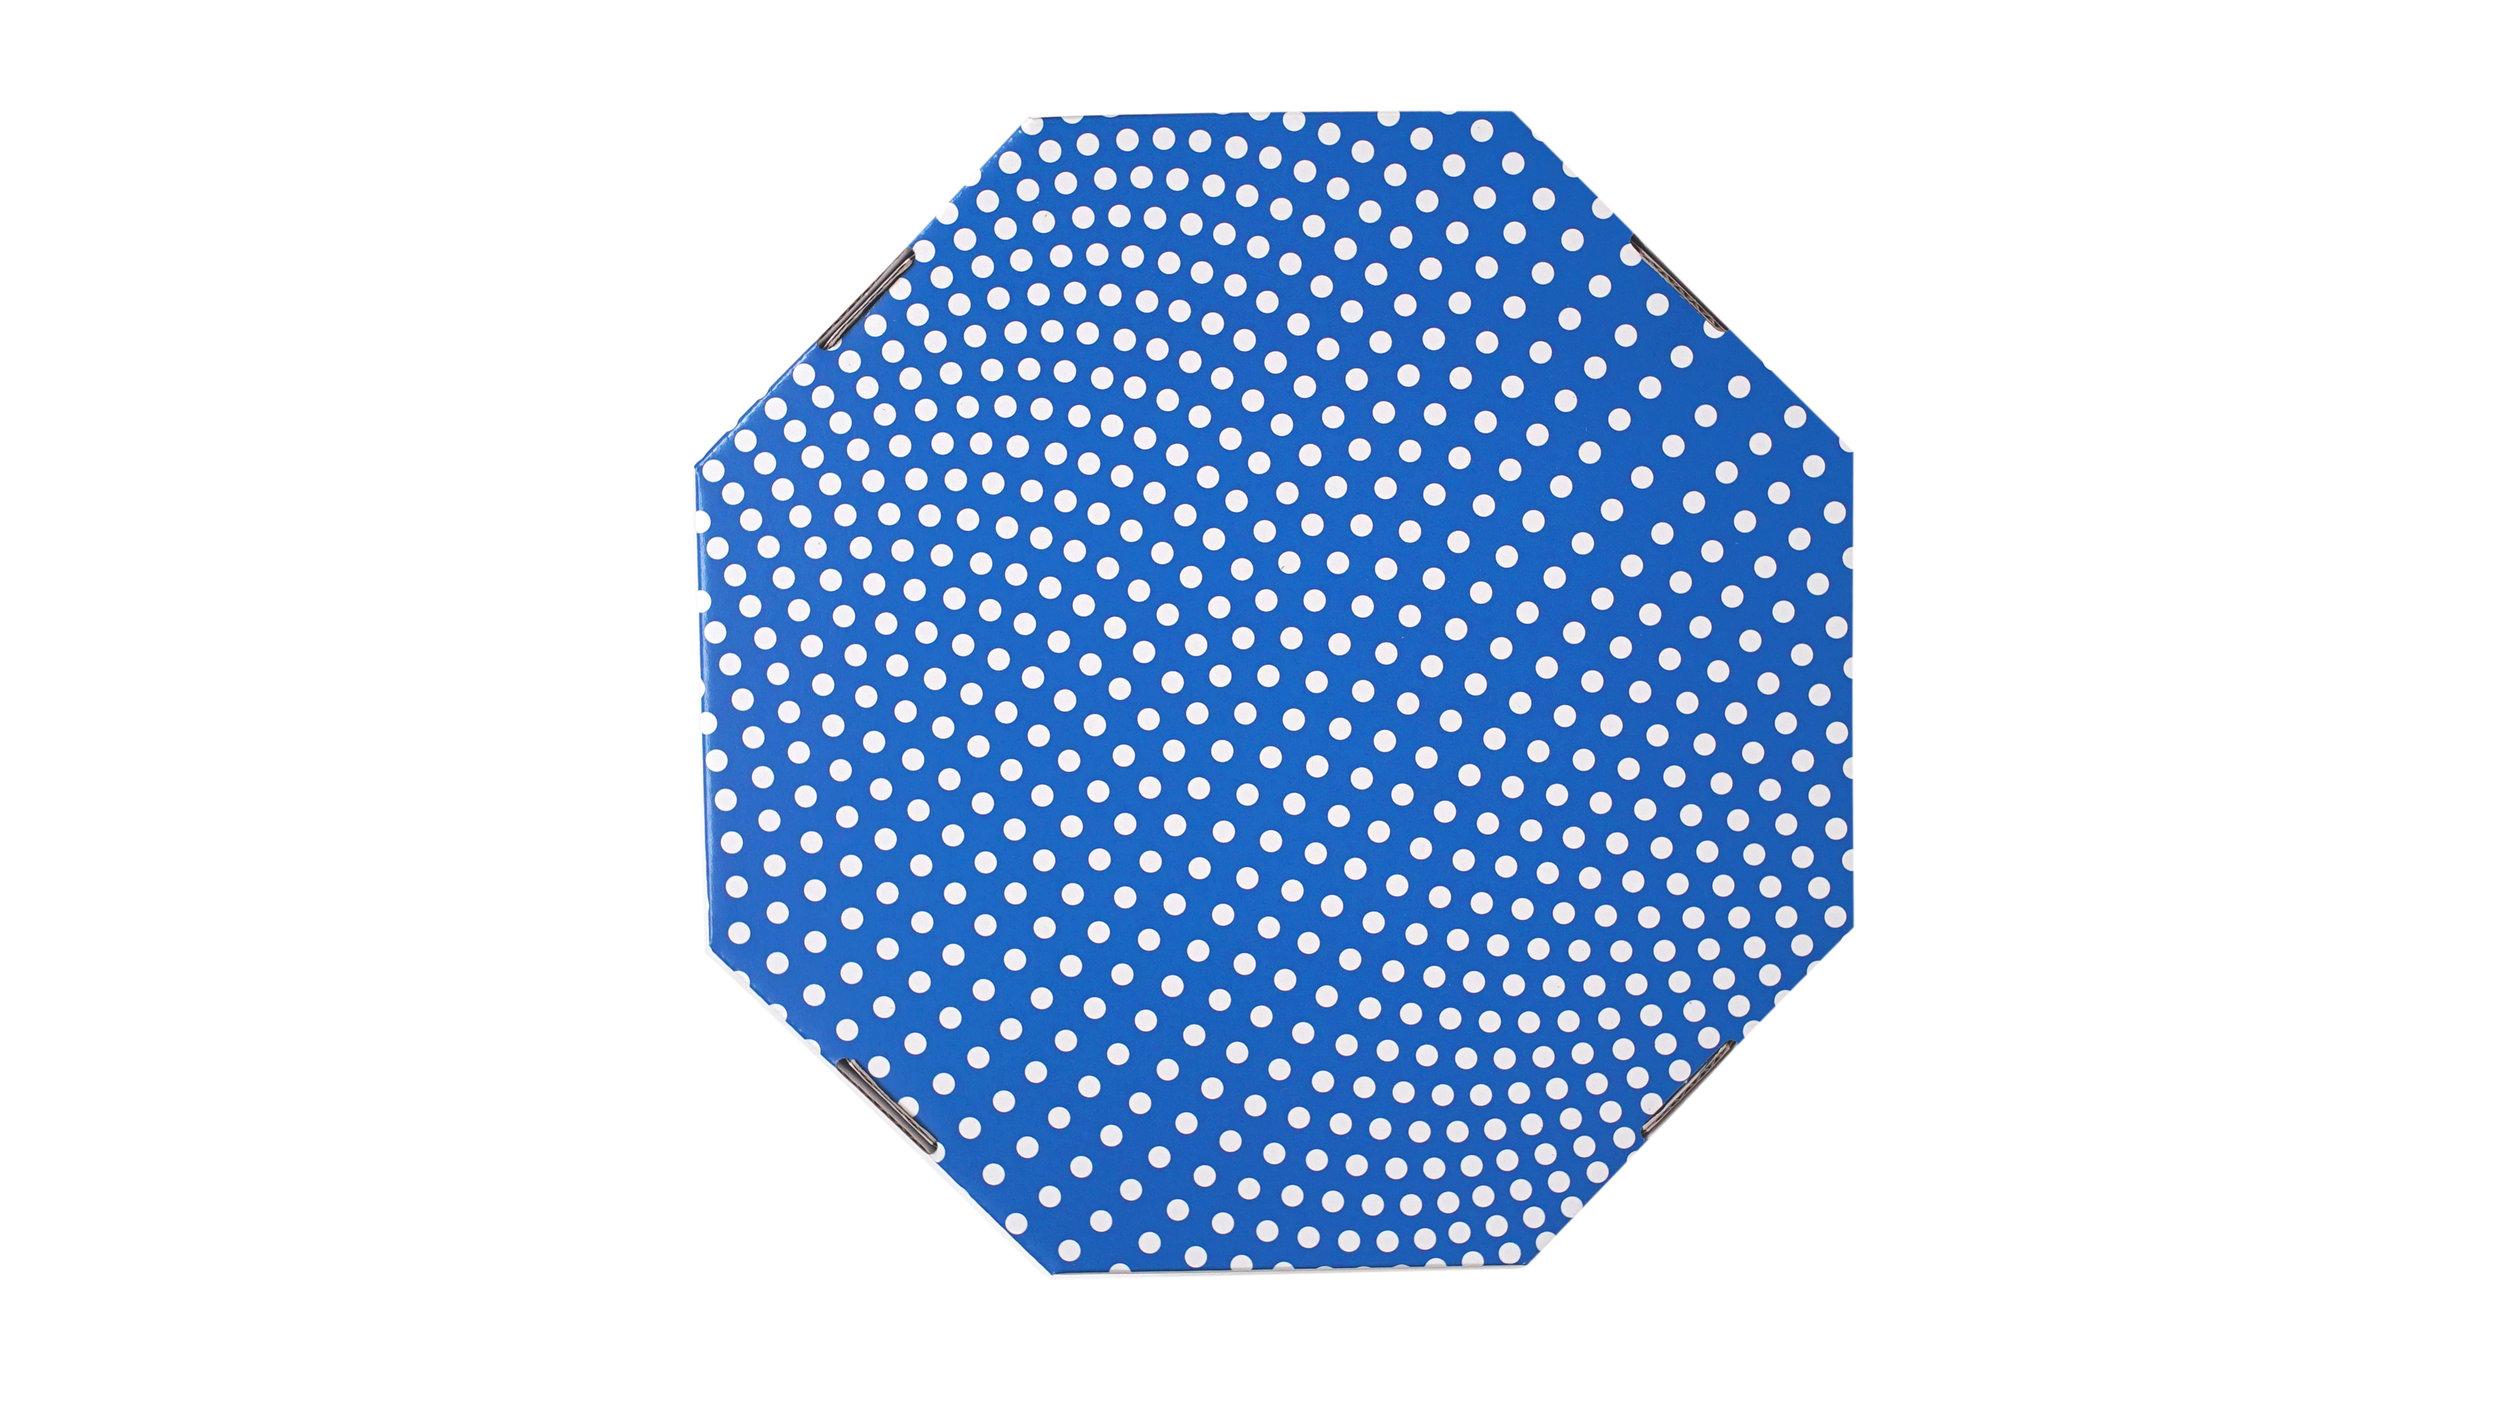 karansingh_lamingtondrive_1000_puzzle_img_03.jpg